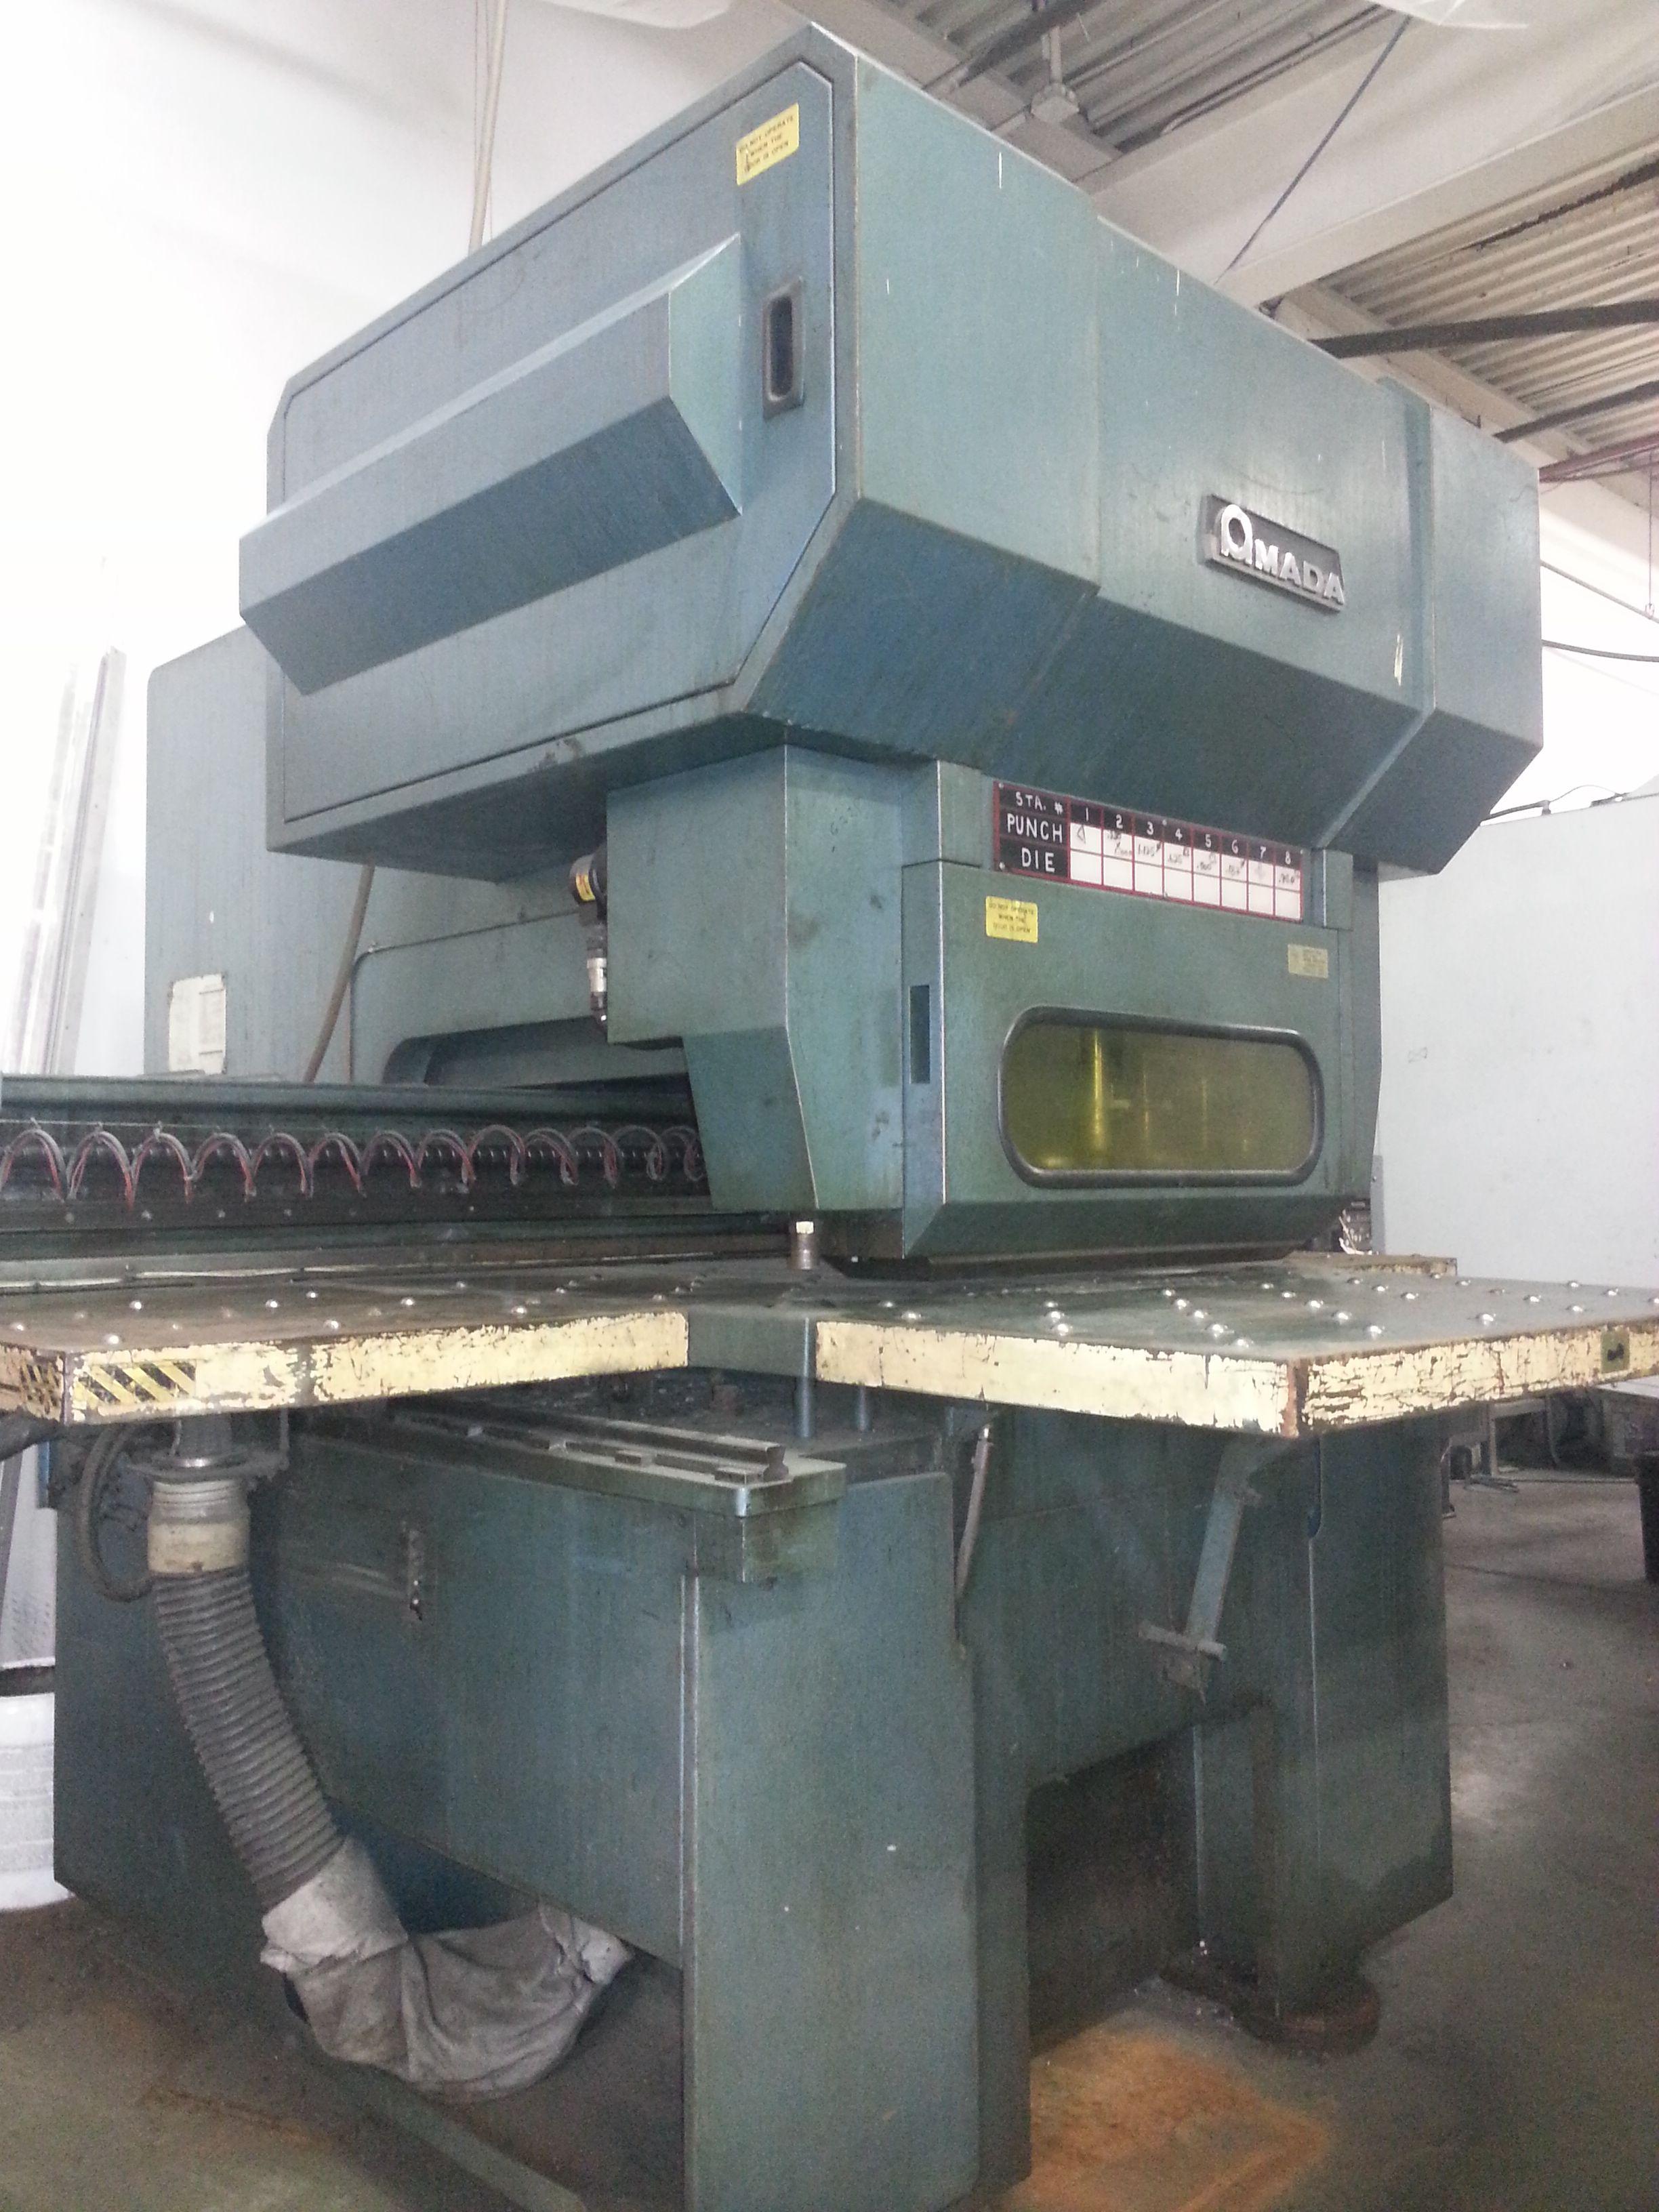 Amada 30-30-40 Punch Press, Fanuc 0 System 6M, 33 Ton